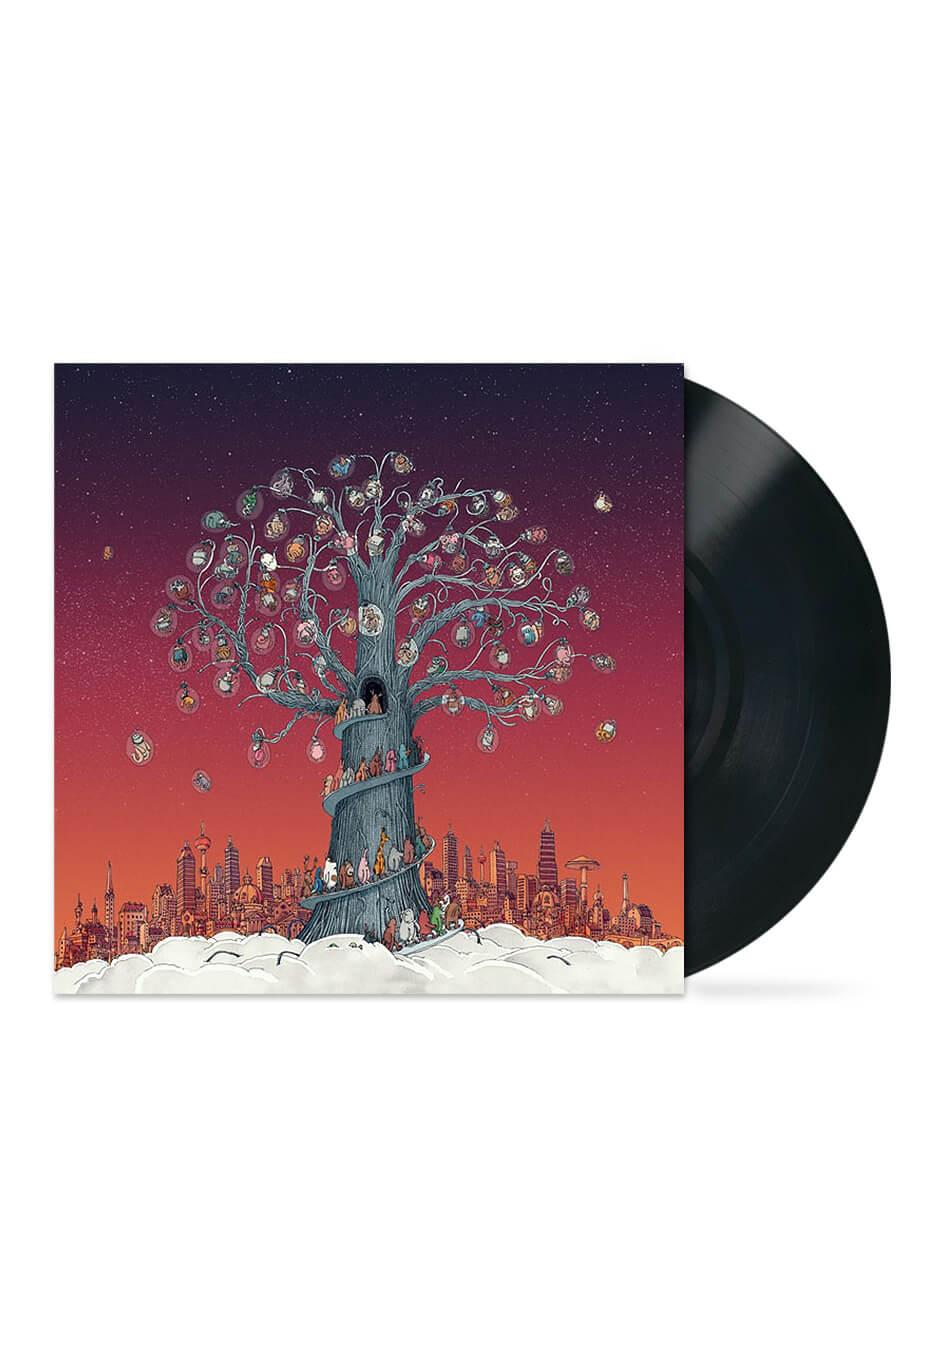 Dance Gavin Dance - Artificial Selection - Vinyl